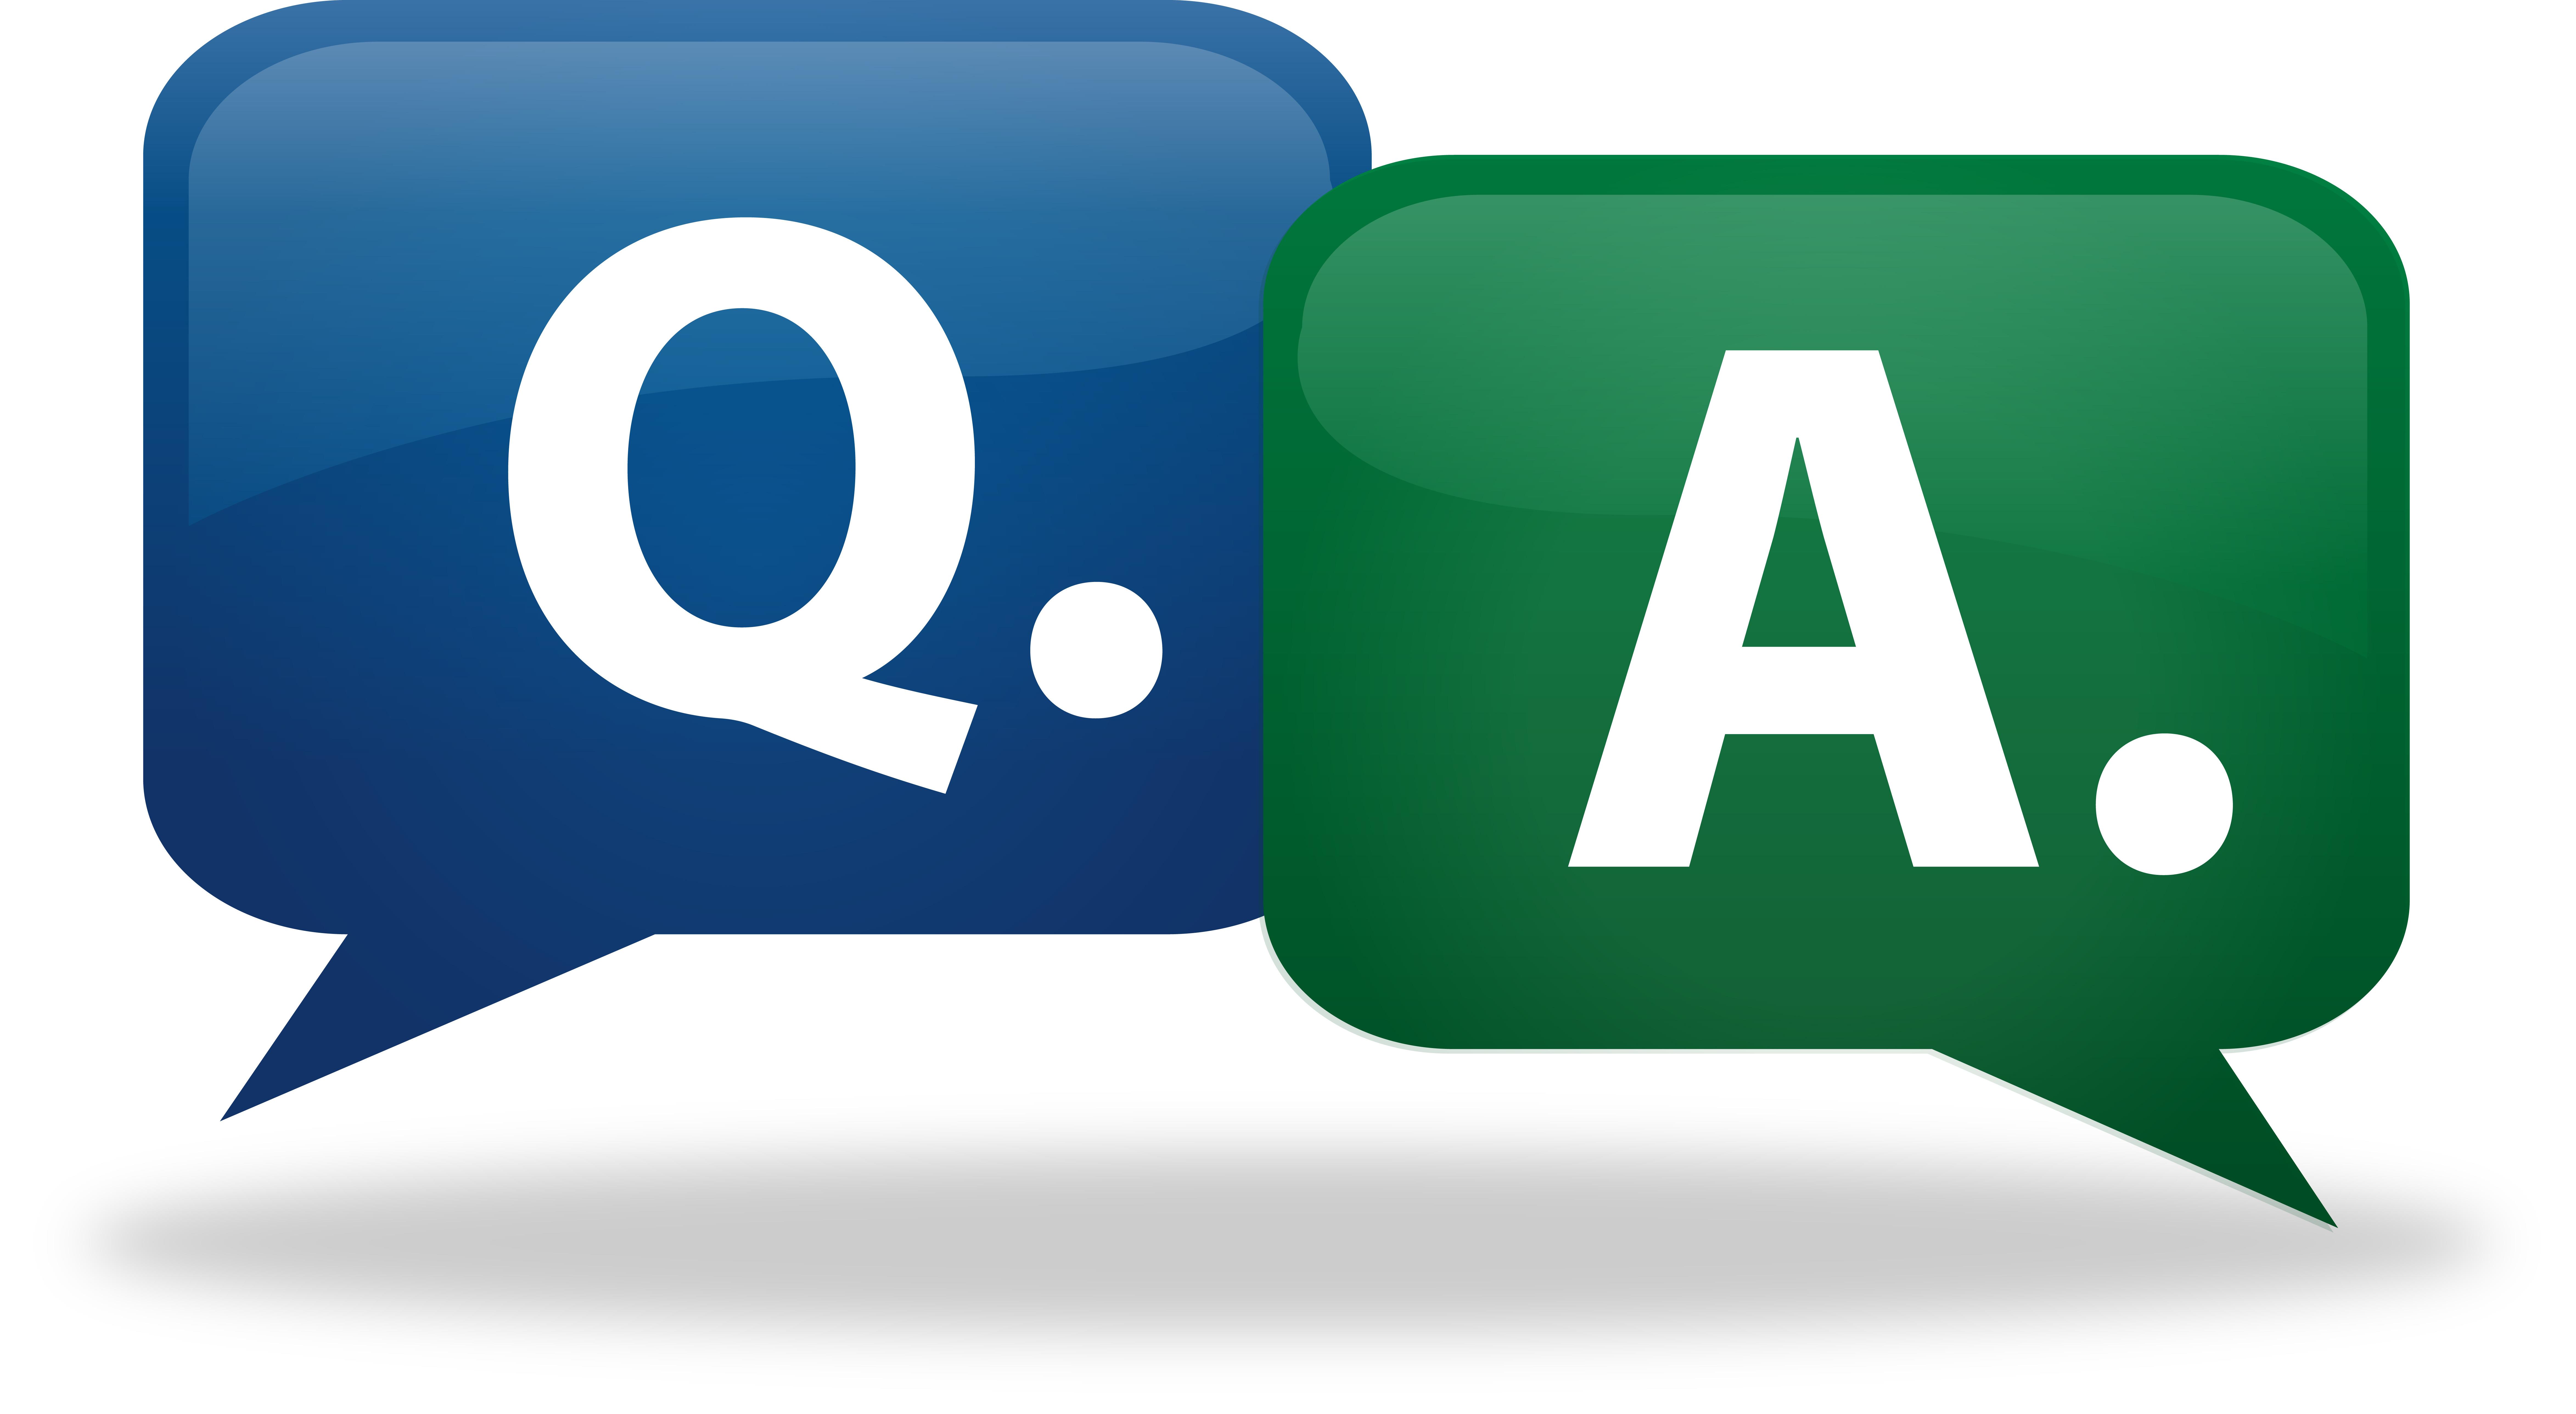 Franchise Q & A - workingmums.co.uk